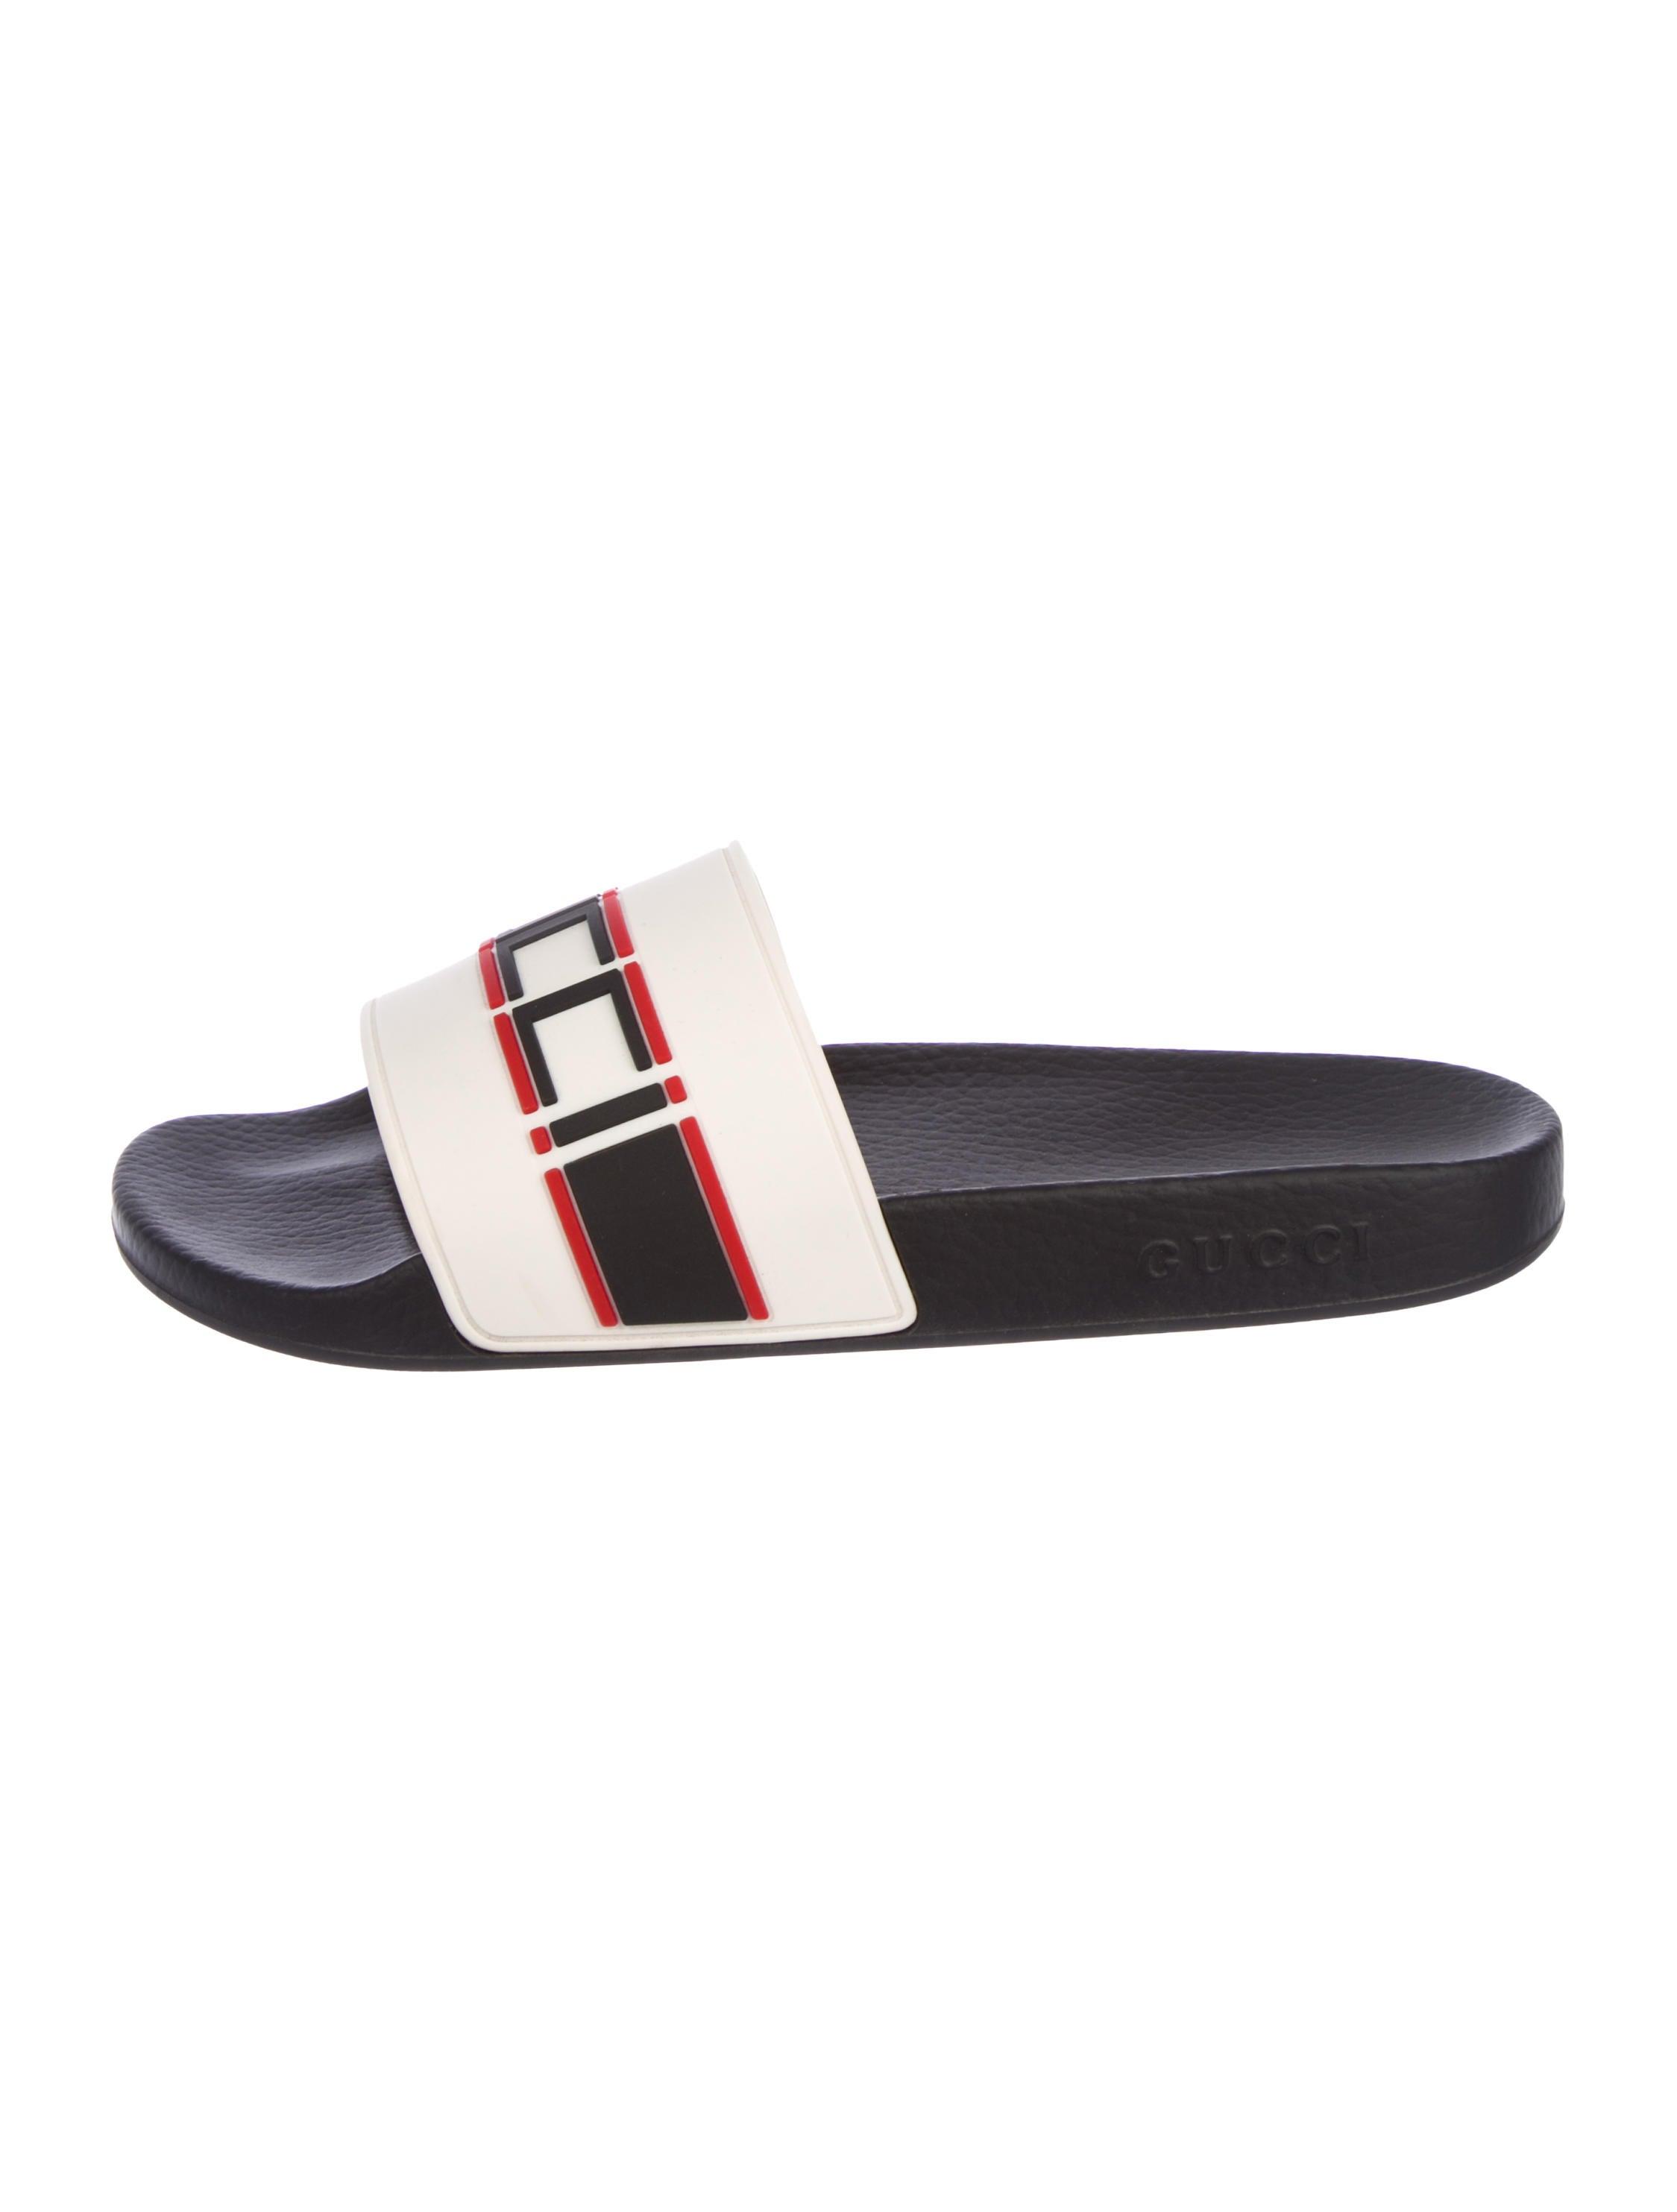 235505e603c Gucci 2018 Logo Print Slides - Shoes - GUC252924